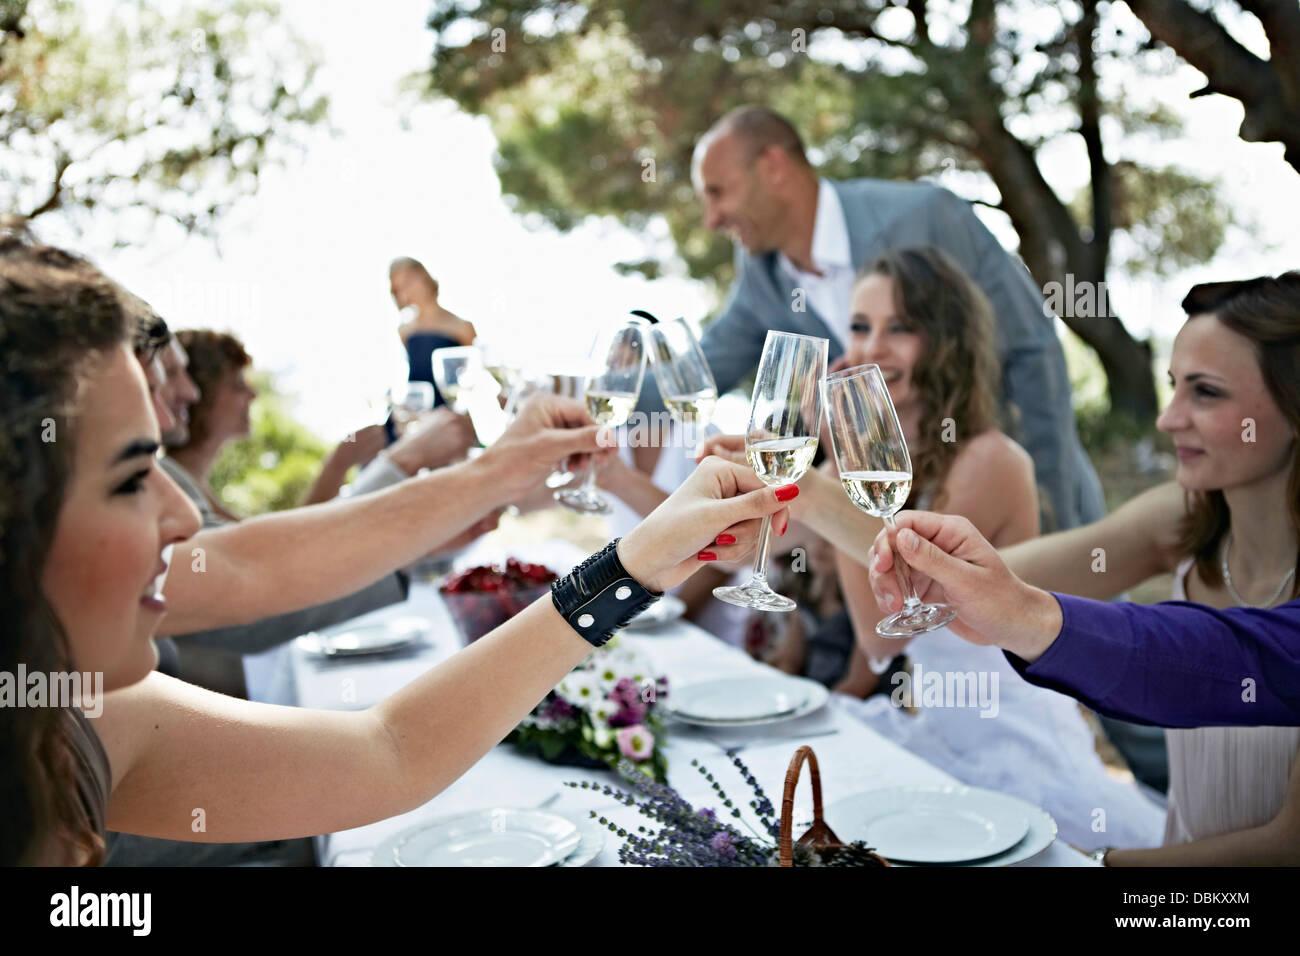 Hochzeit feiern im Freien, Kroatien, Europa Stockbild